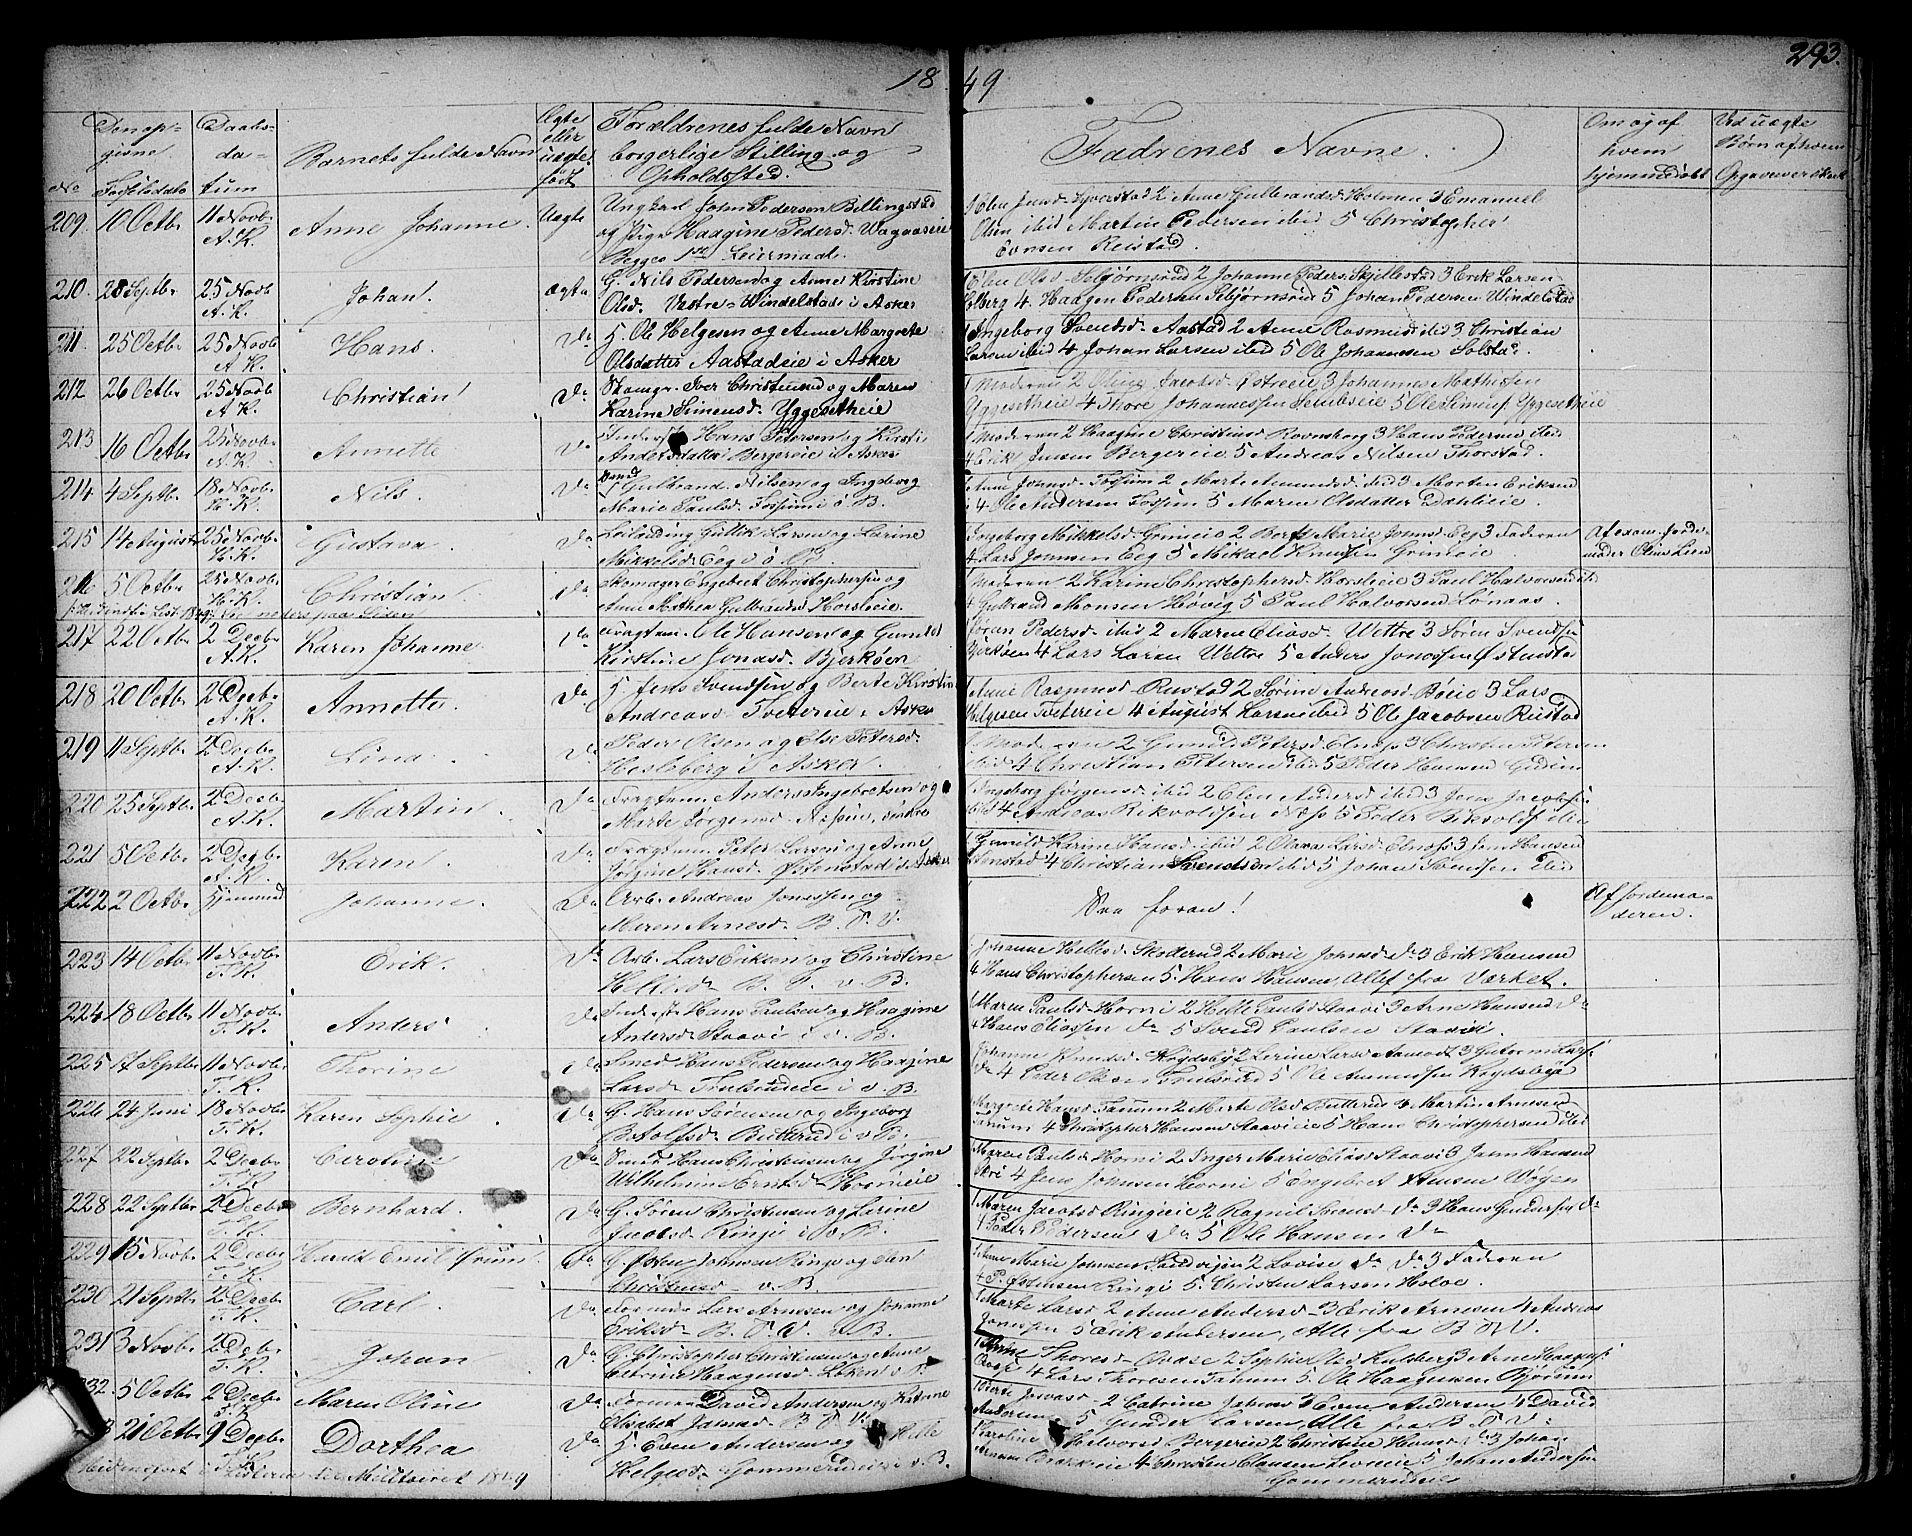 SAO, Asker prestekontor Kirkebøker, F/Fa/L0007: Parish register (official) no. I 7, 1825-1864, p. 293